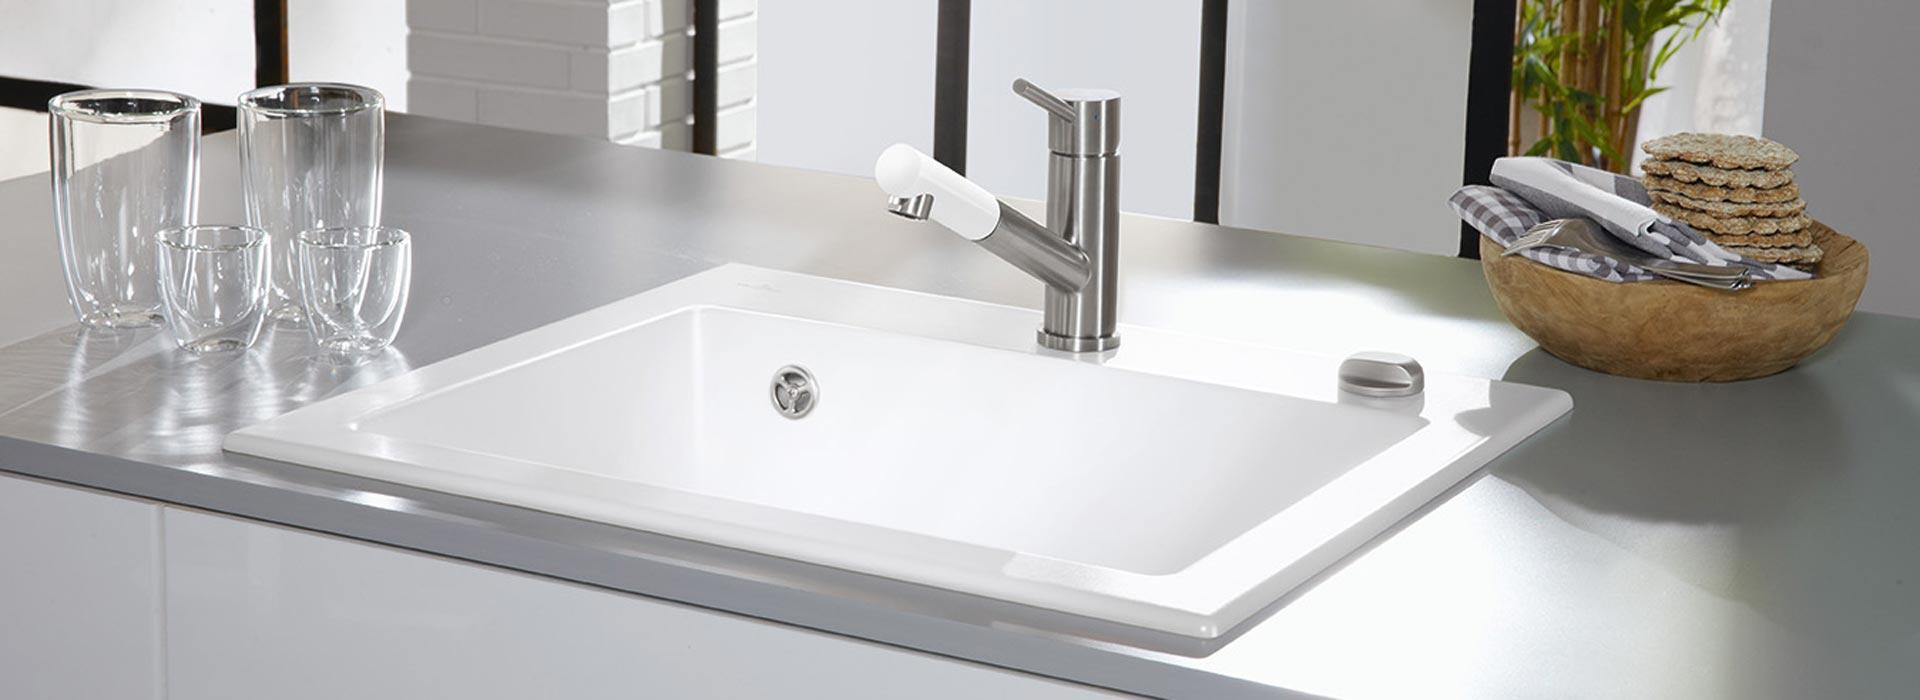 Glasplaat Keuken Gamma : Villeroy & Boch Bathroom Sink